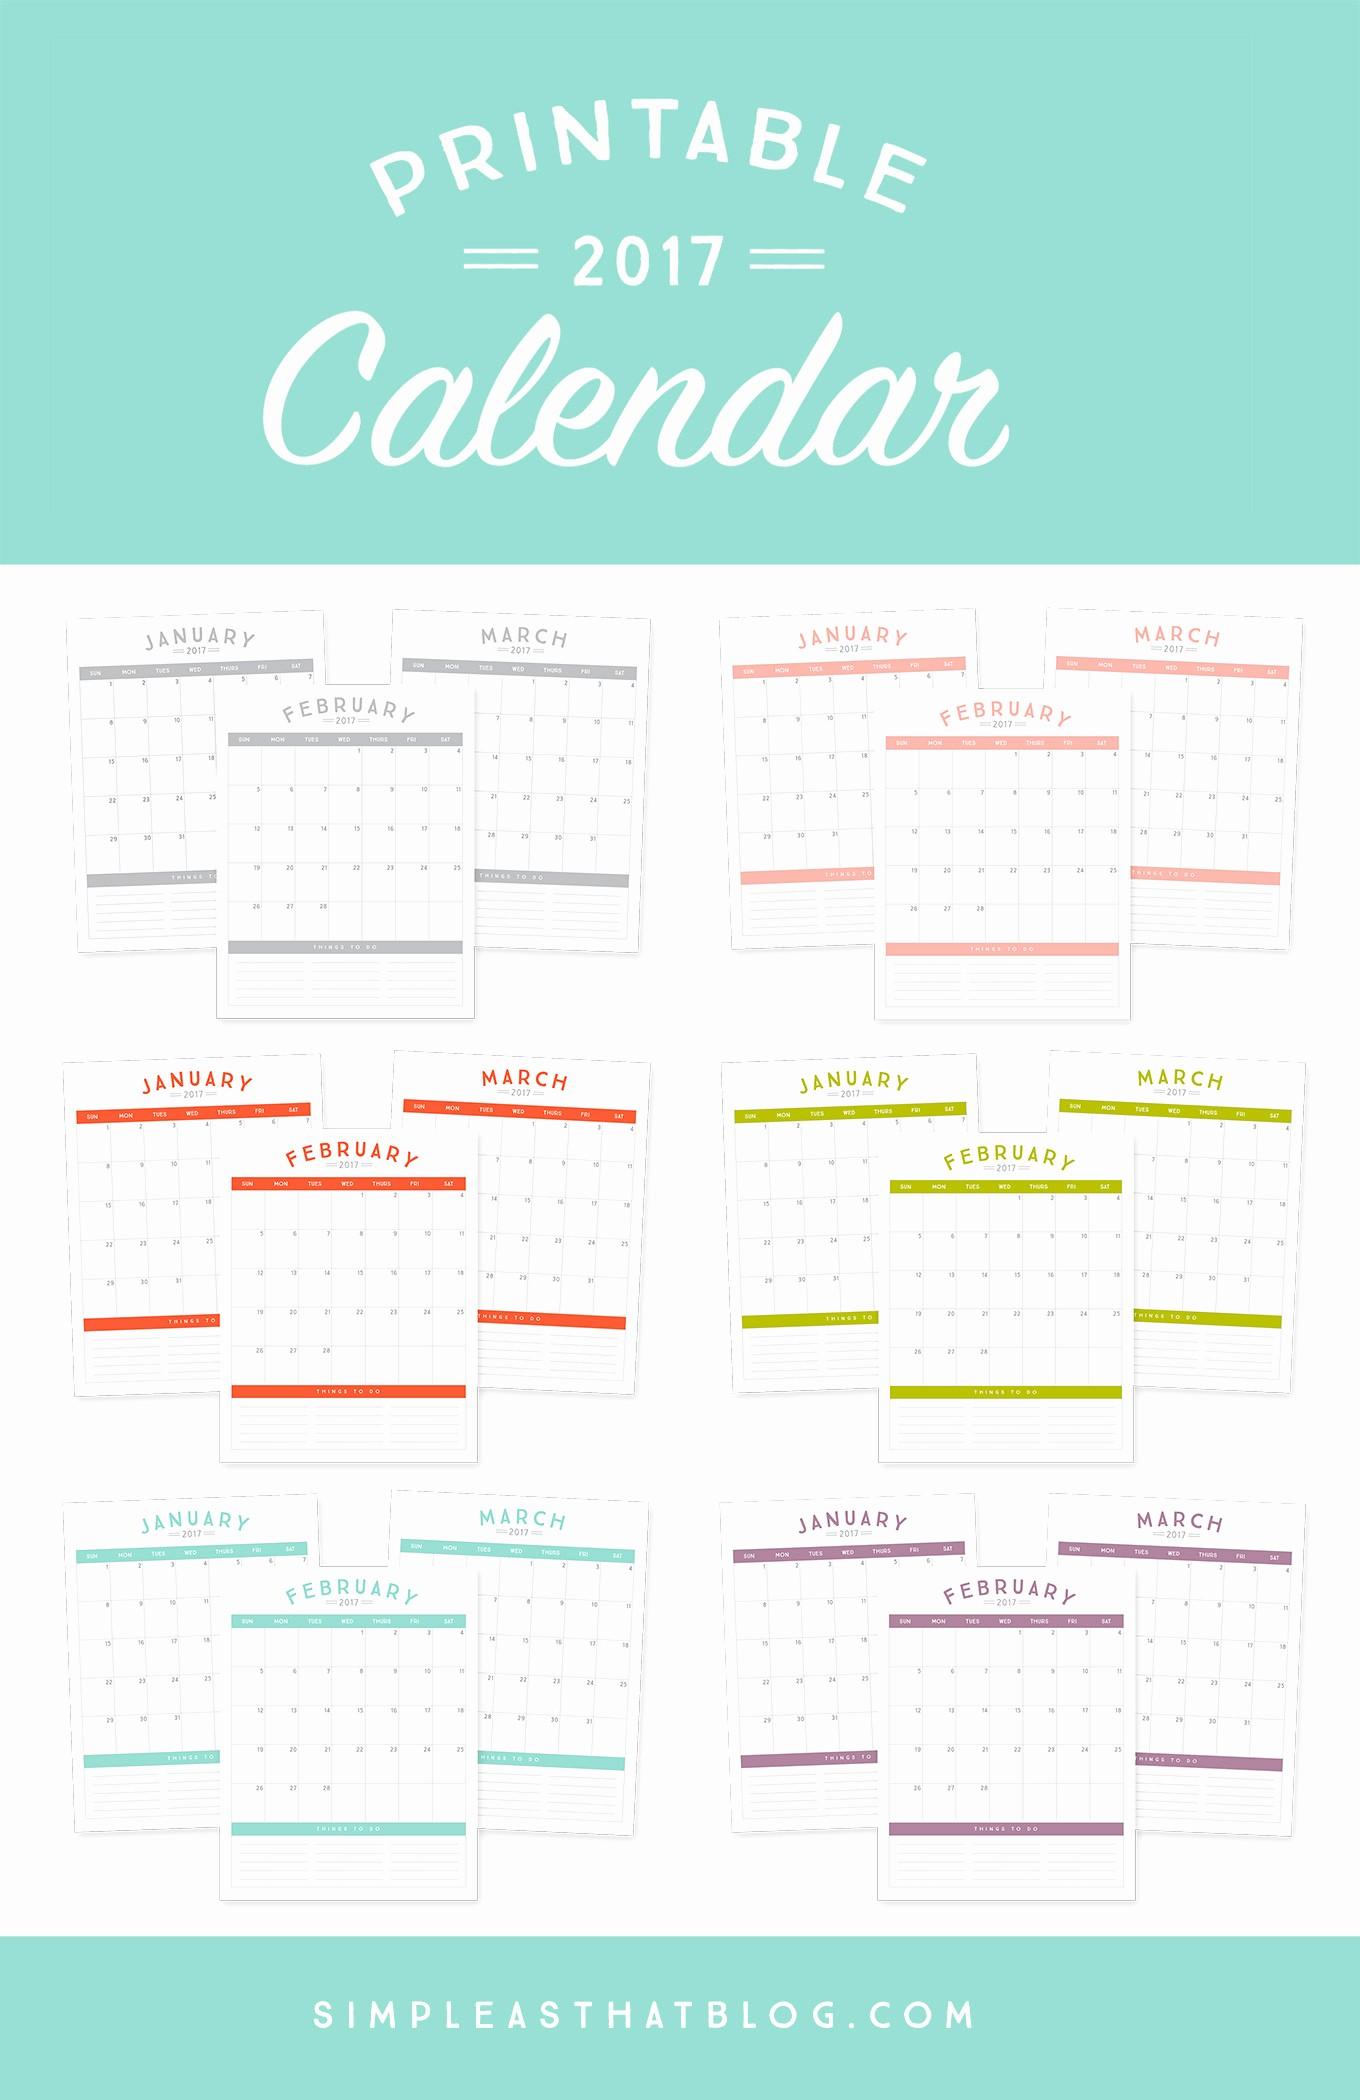 Printable 3 Month Calendar 2017 Unique Free Printable 2017 Calendar